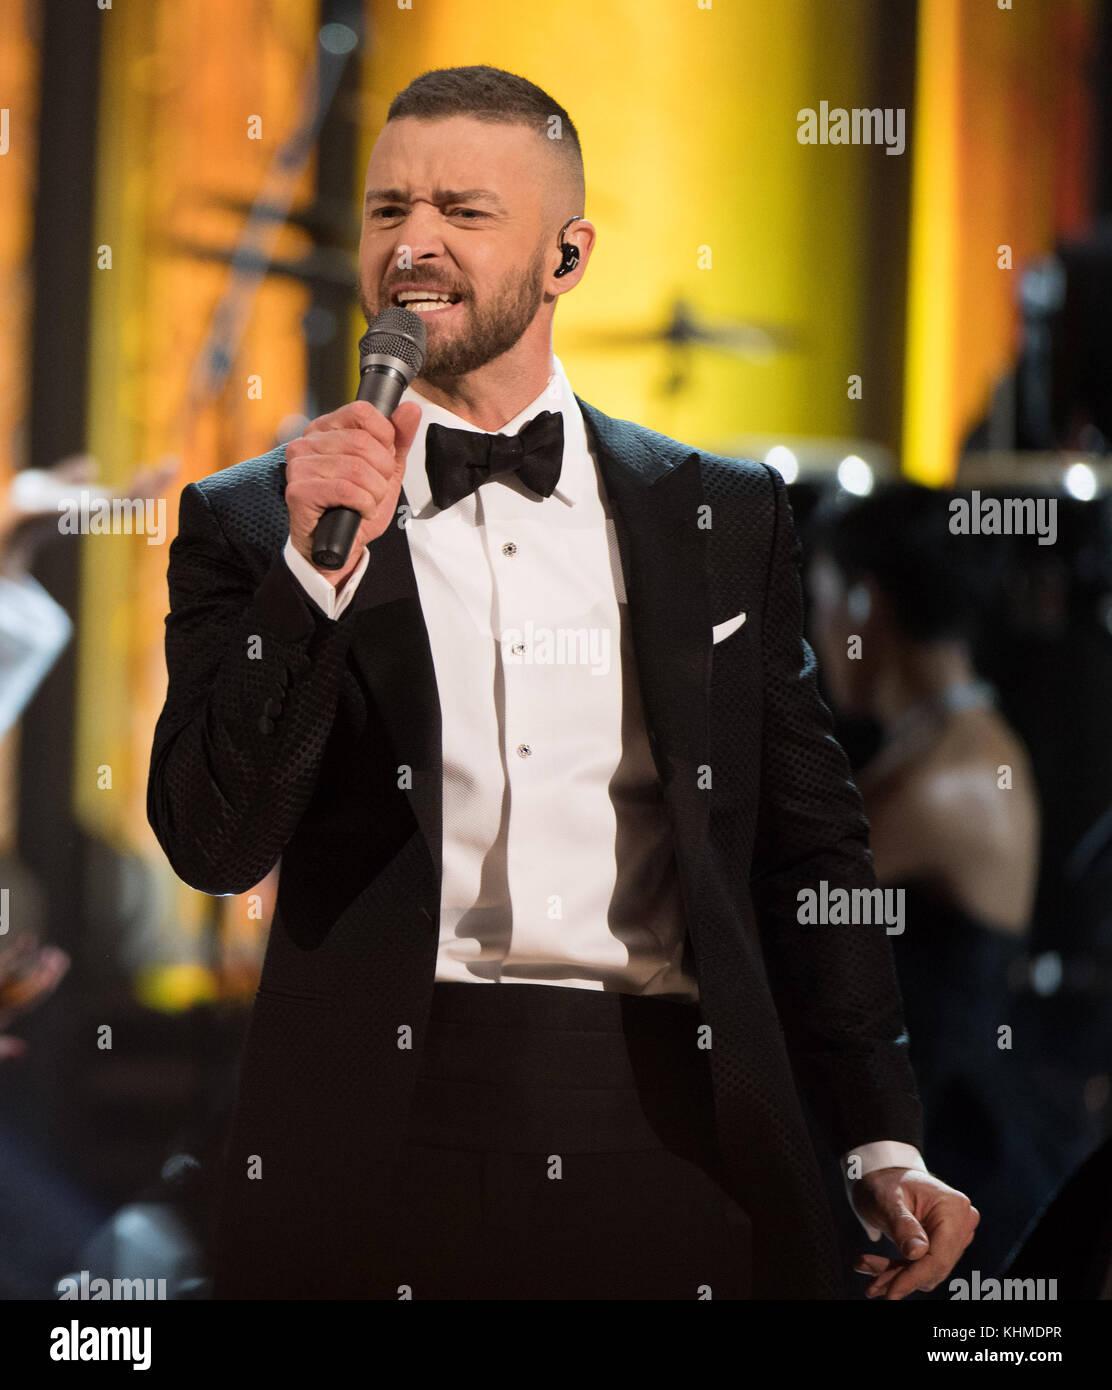 Hollywood, CA - 26. Februar: Justin Timberlake nimmt die 89. jährlichen Academy Awards in Hollywood & Highland Center Stockfoto